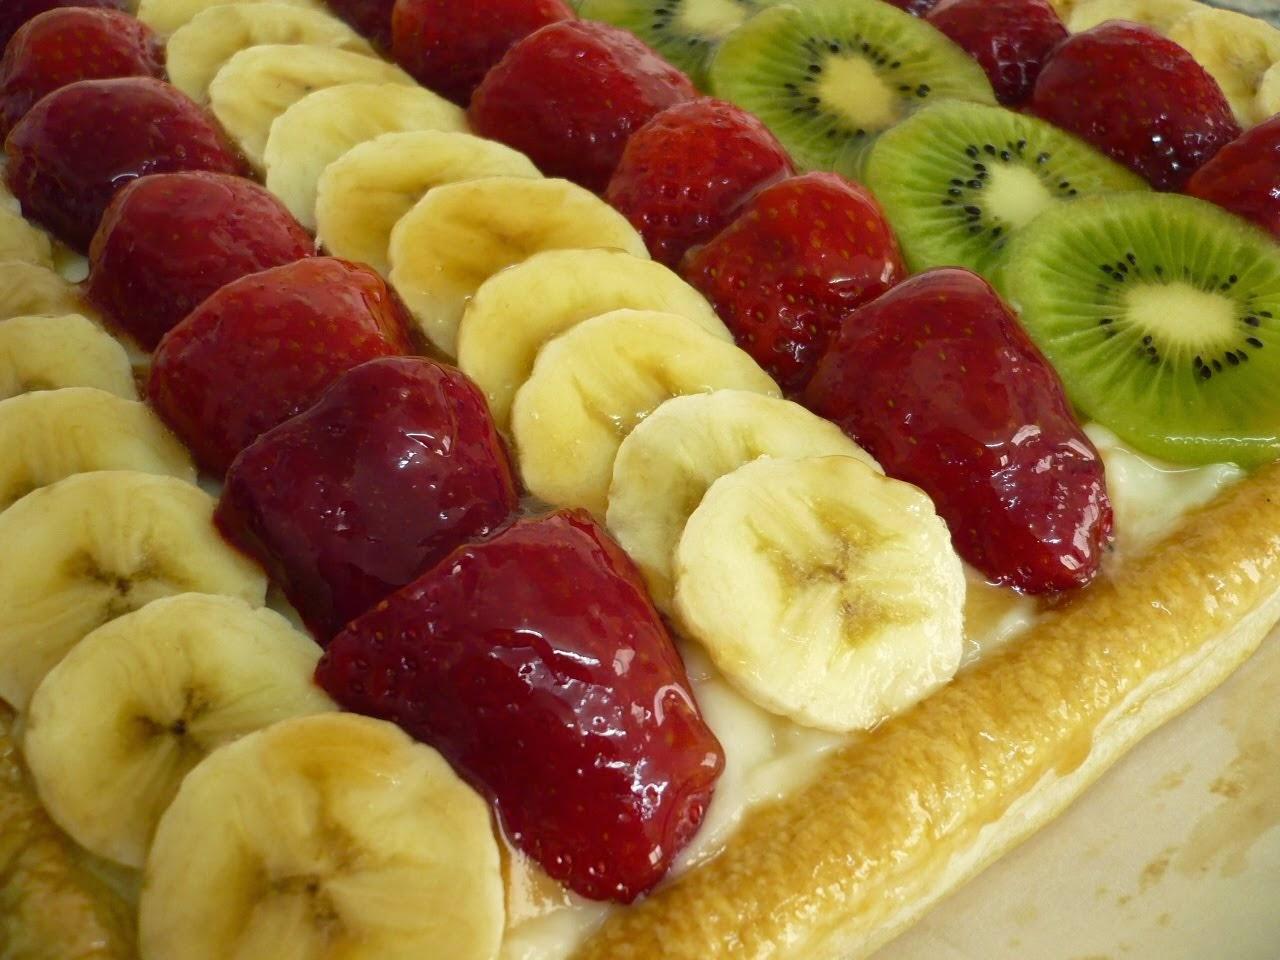 Hojaldritos con frutas de temporada